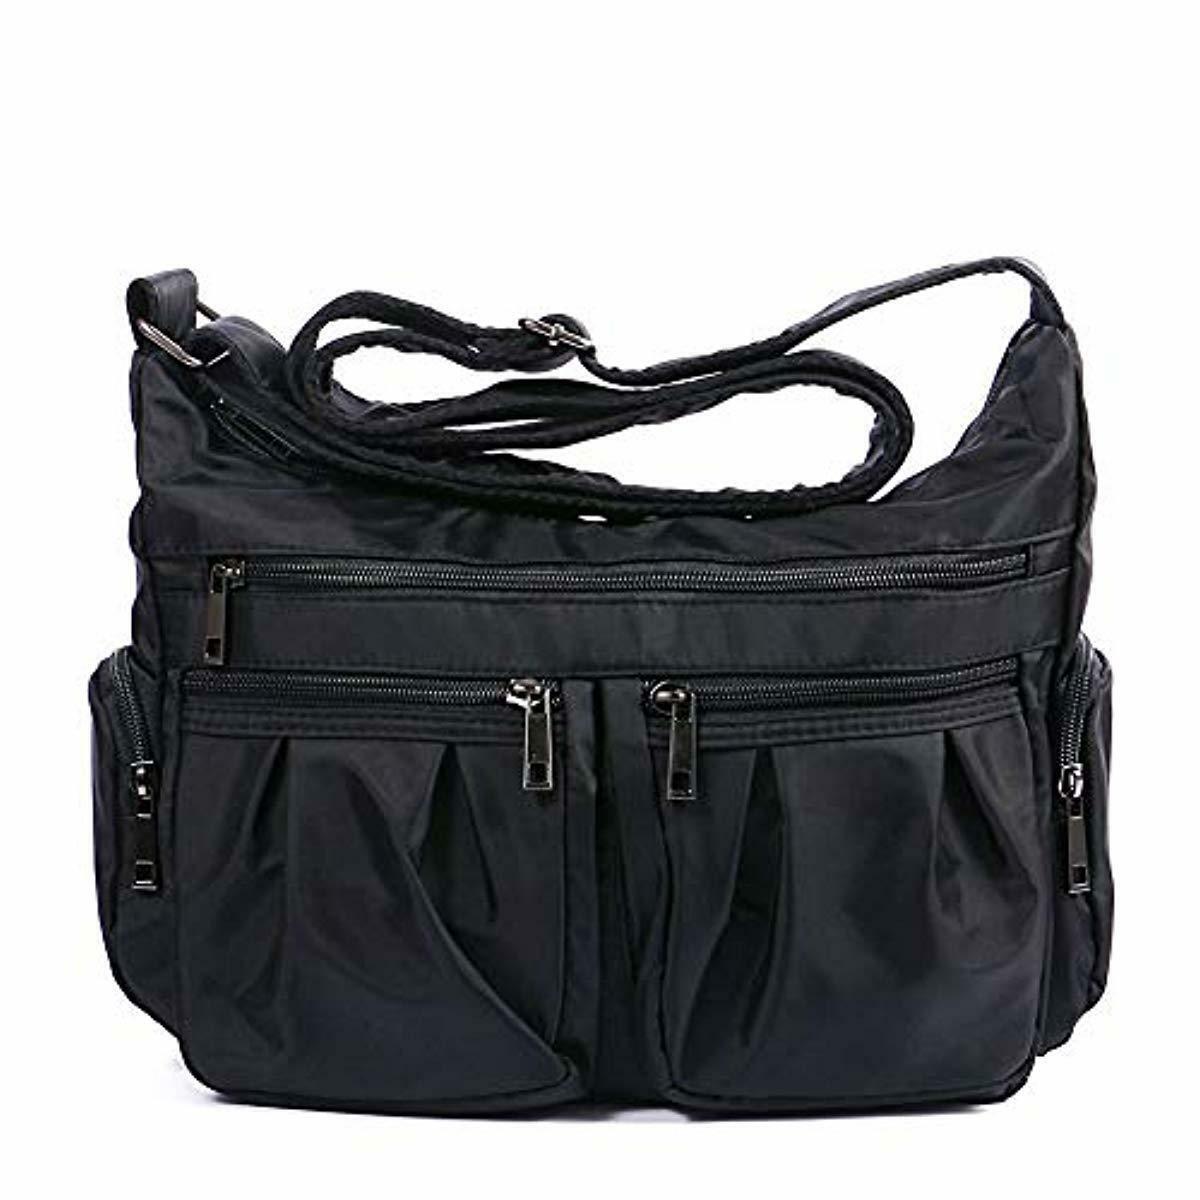 Crossbody Bags for Women Multi Pocket Shoulder Bag Waterproo